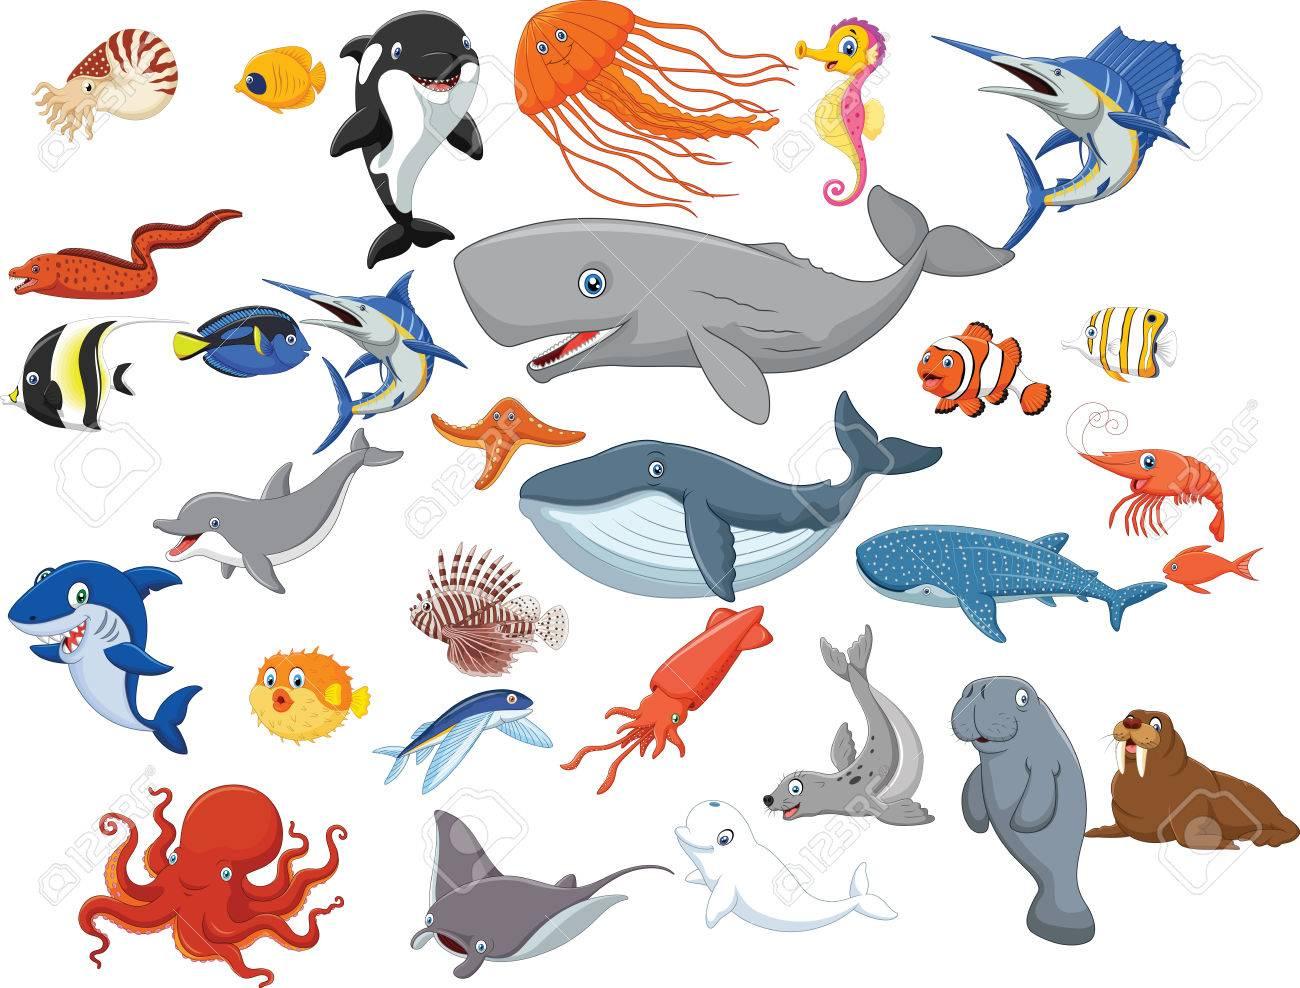 Vector illustration of Cartoon sea animals isolated on white background - 56170911